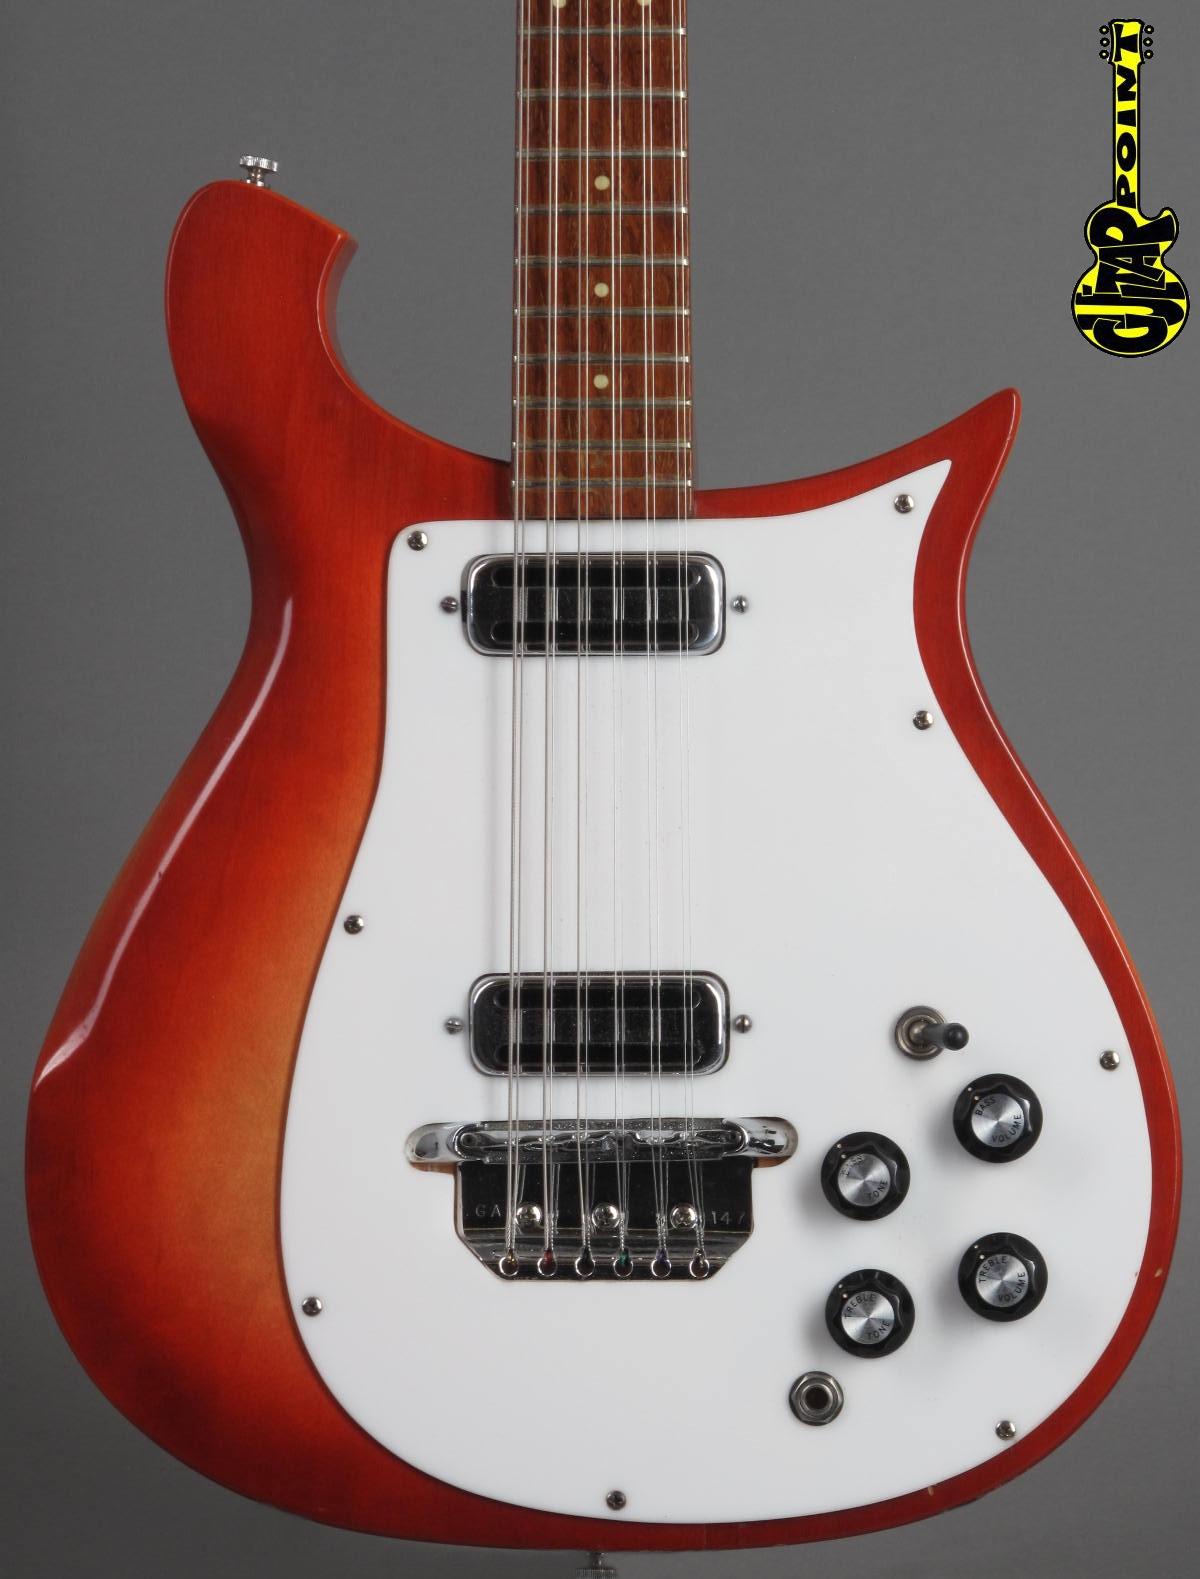 1967 Rickenbacker 450-12 /  Fireglo